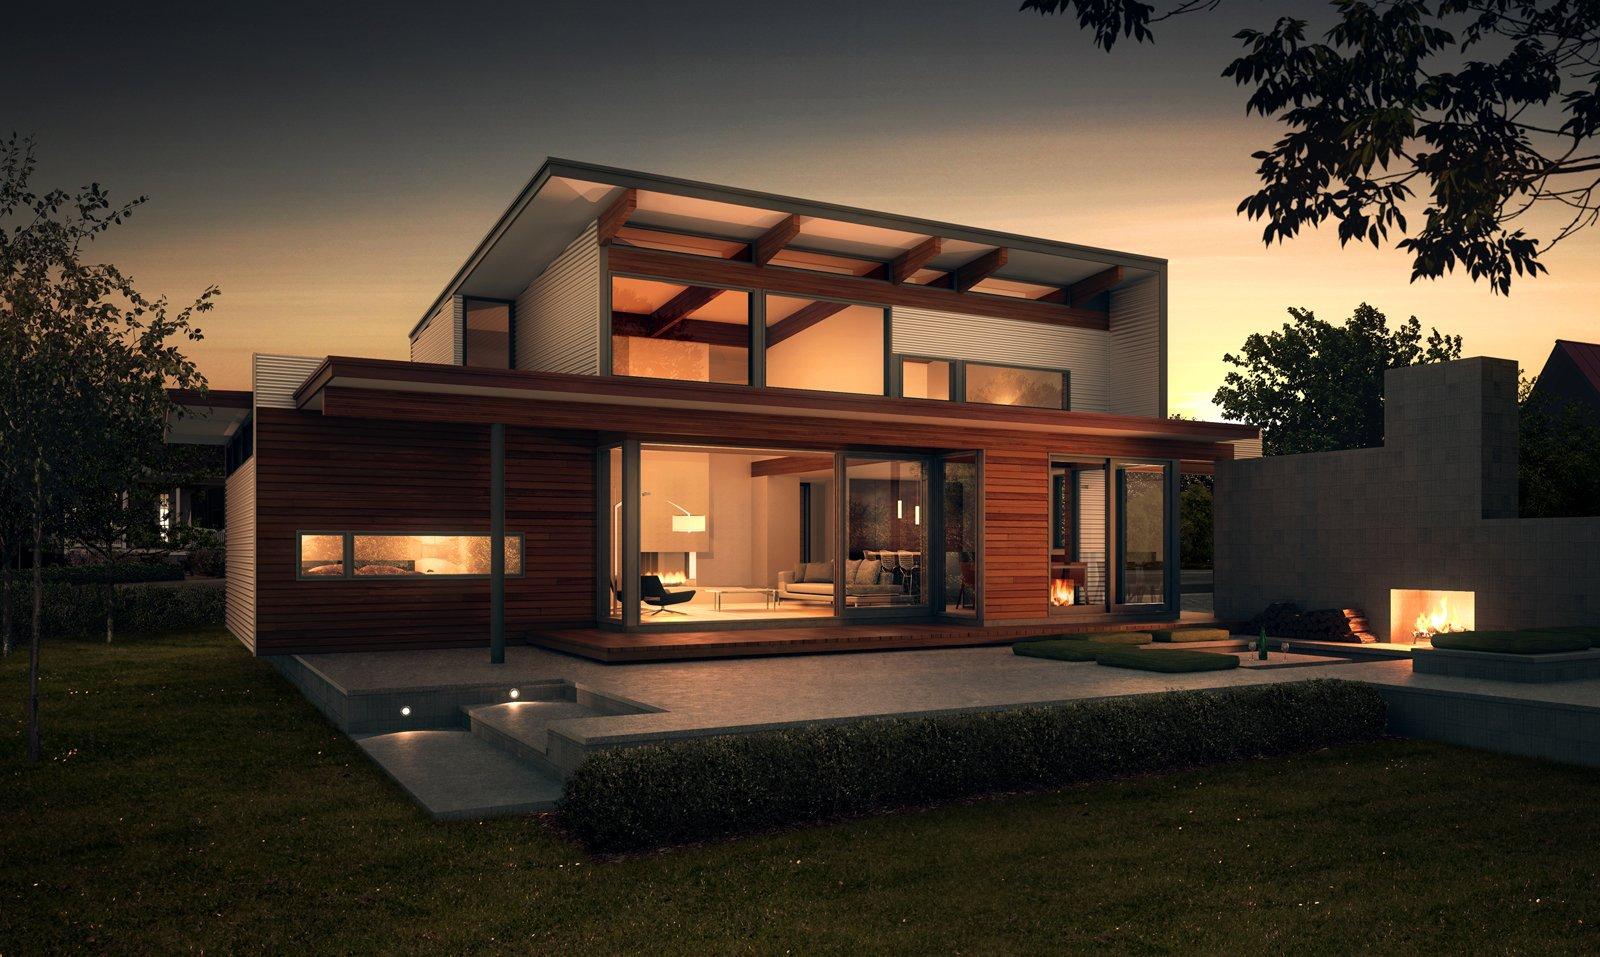 Preview: Joel Turkel, Prefab Design - Dwell on linda l cedar homes, dwell prefab homes, turkel prefab homes,